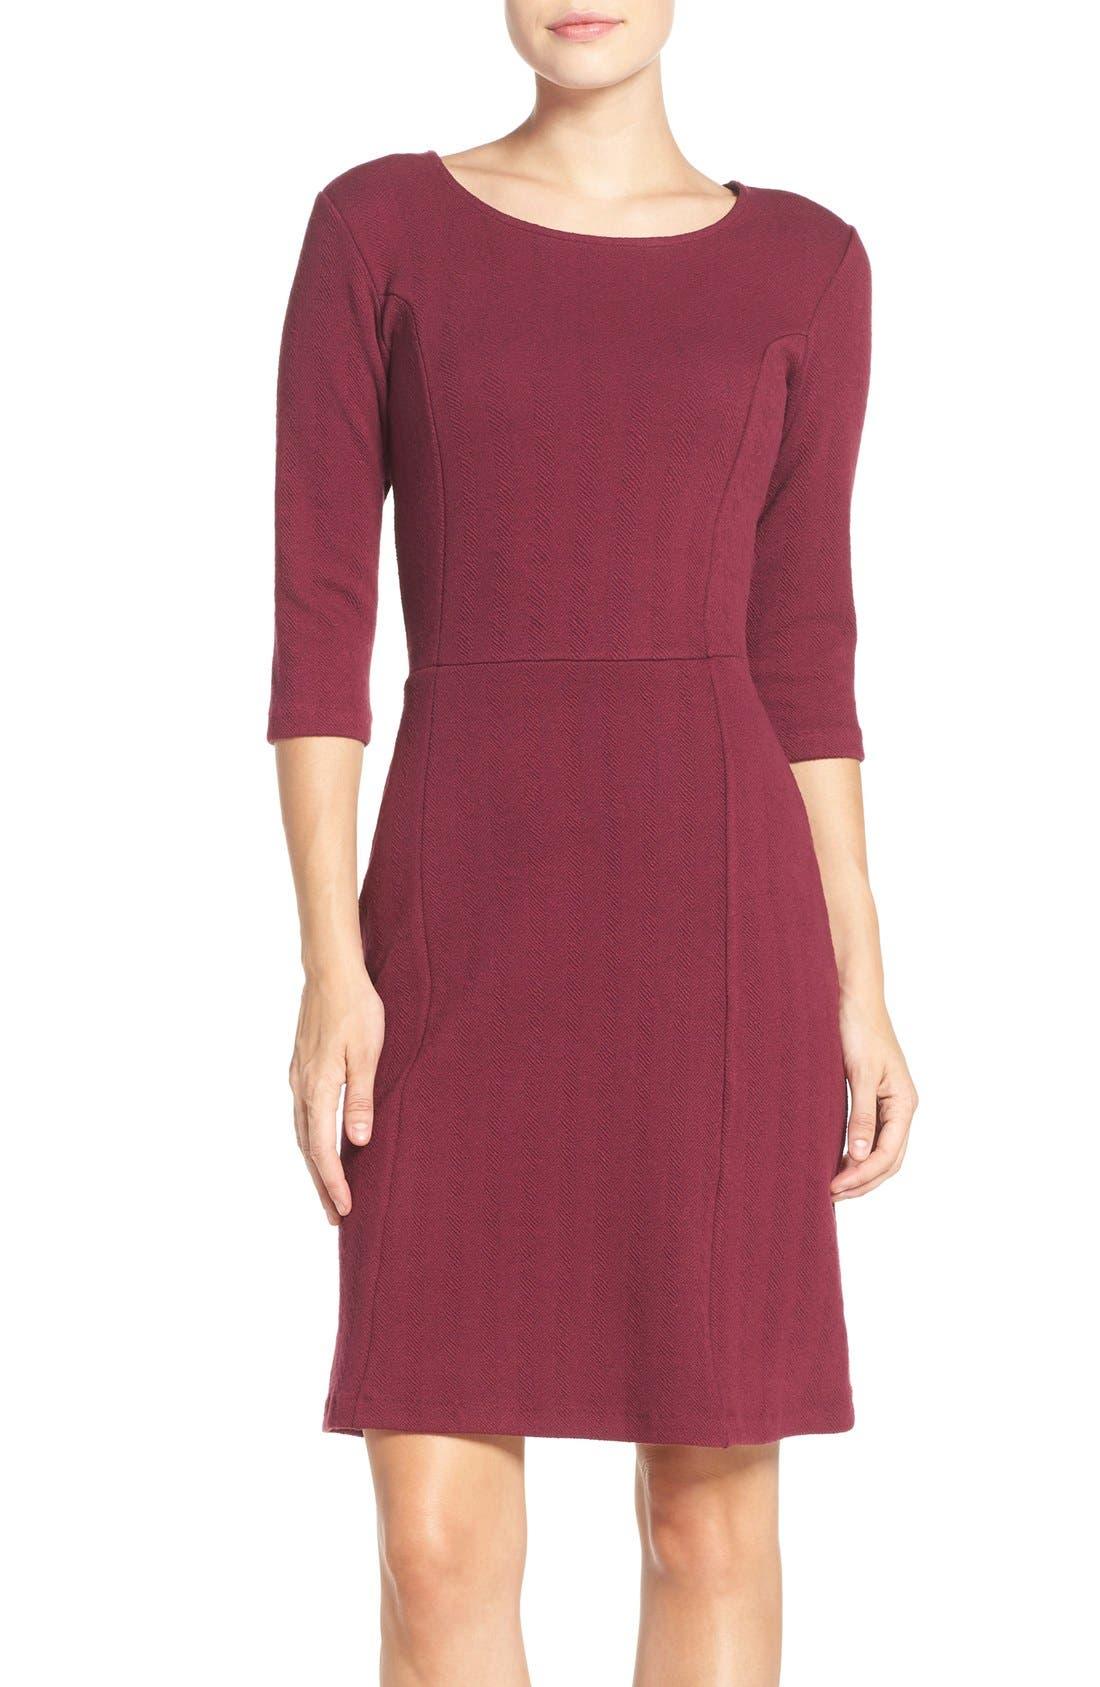 Alternate Image 1 Selected - Leota 'Avery' Jacquard Knit Sheath Dress